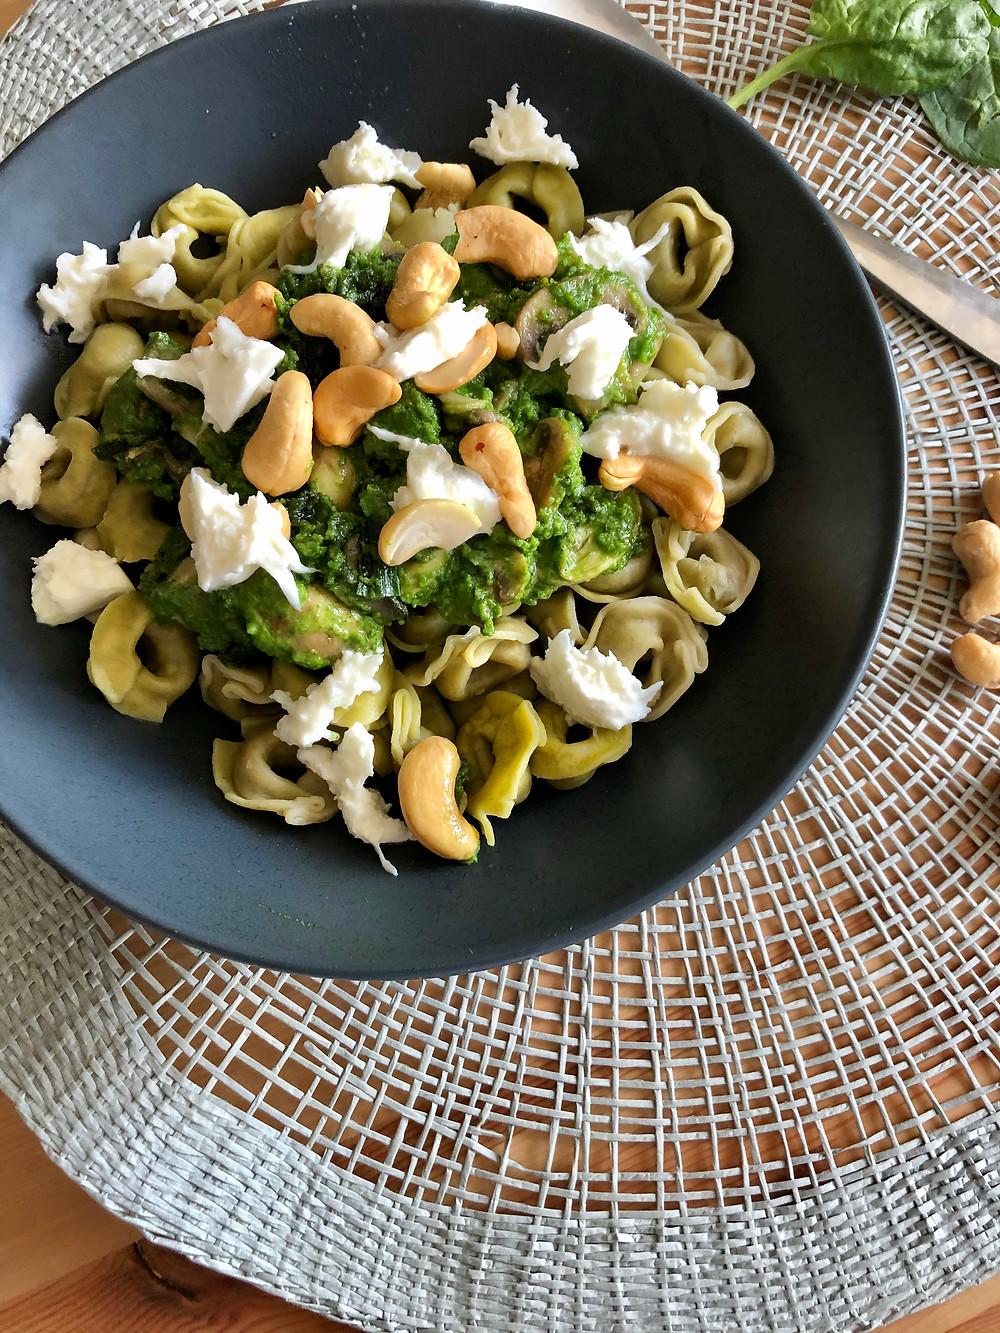 Blondieskeuken, Blondies Keuken, Sam de Roos, toegankelijke recepten, makkelijke recepten, recepten, lekkere recepten, Tortellini met spinaziepesto, Recept voor tortellini, recept met spinazie, recept met spinaziepesto, recept voor spinziepesto, verschillende soorten pesto, mozzarella, cashewnoten, spinazie, tortellini, champignons